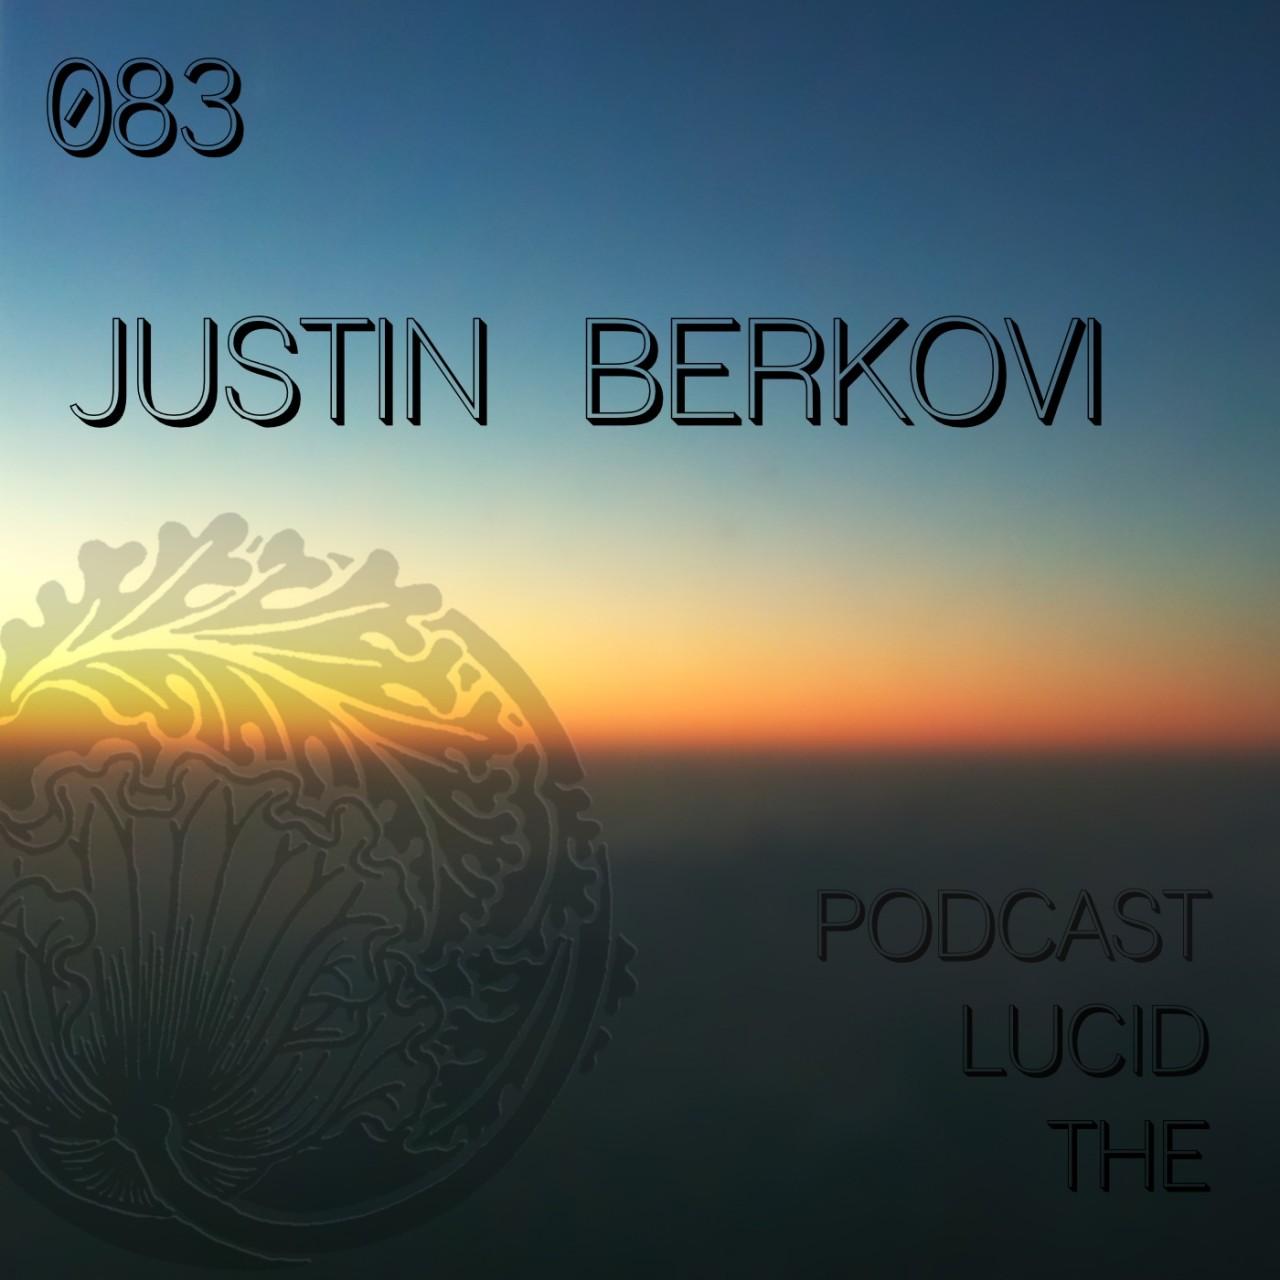 The Lucid Podcast 083 Justin Berkovi (live)